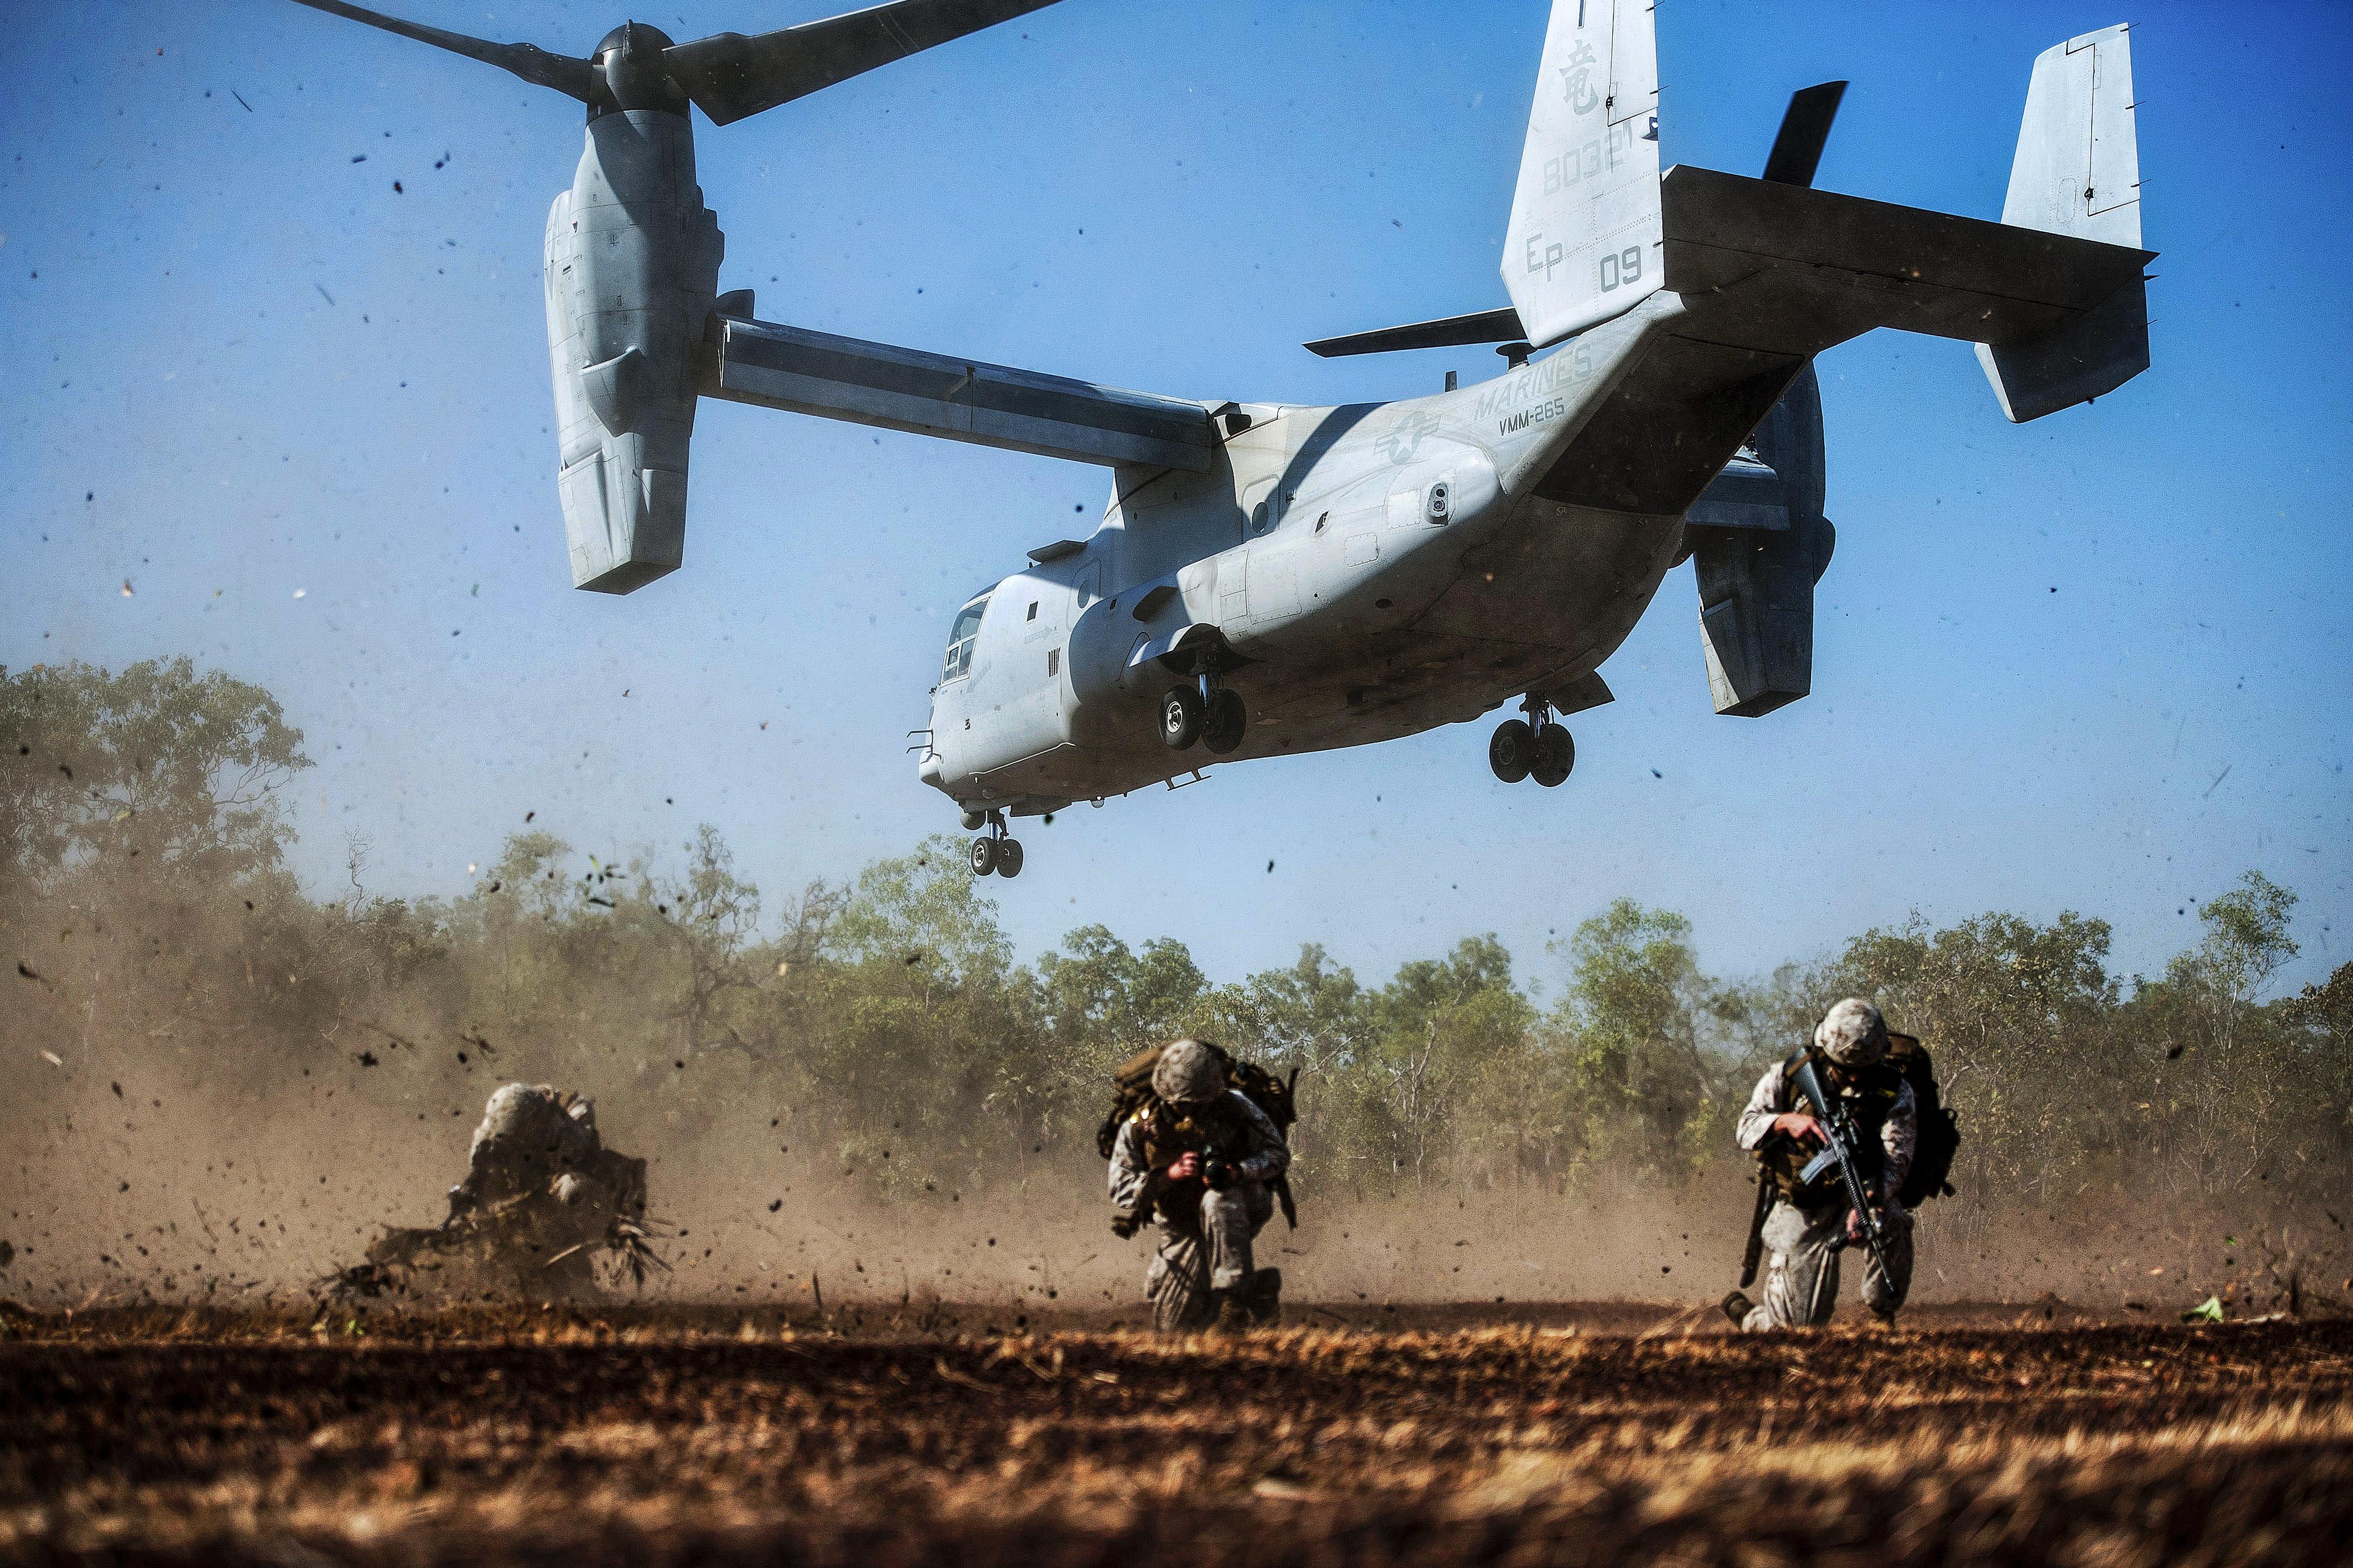 Marines set up a perimeter after a tactical insertion with an MV-22 Osprey tilt rotor aircraft as part of an amphibious assault during Talisman Sabre 2015 at Fog Bay, Australia, July 11, 2015. (Petty Officer 1st Class Louis Rojas/Navy)